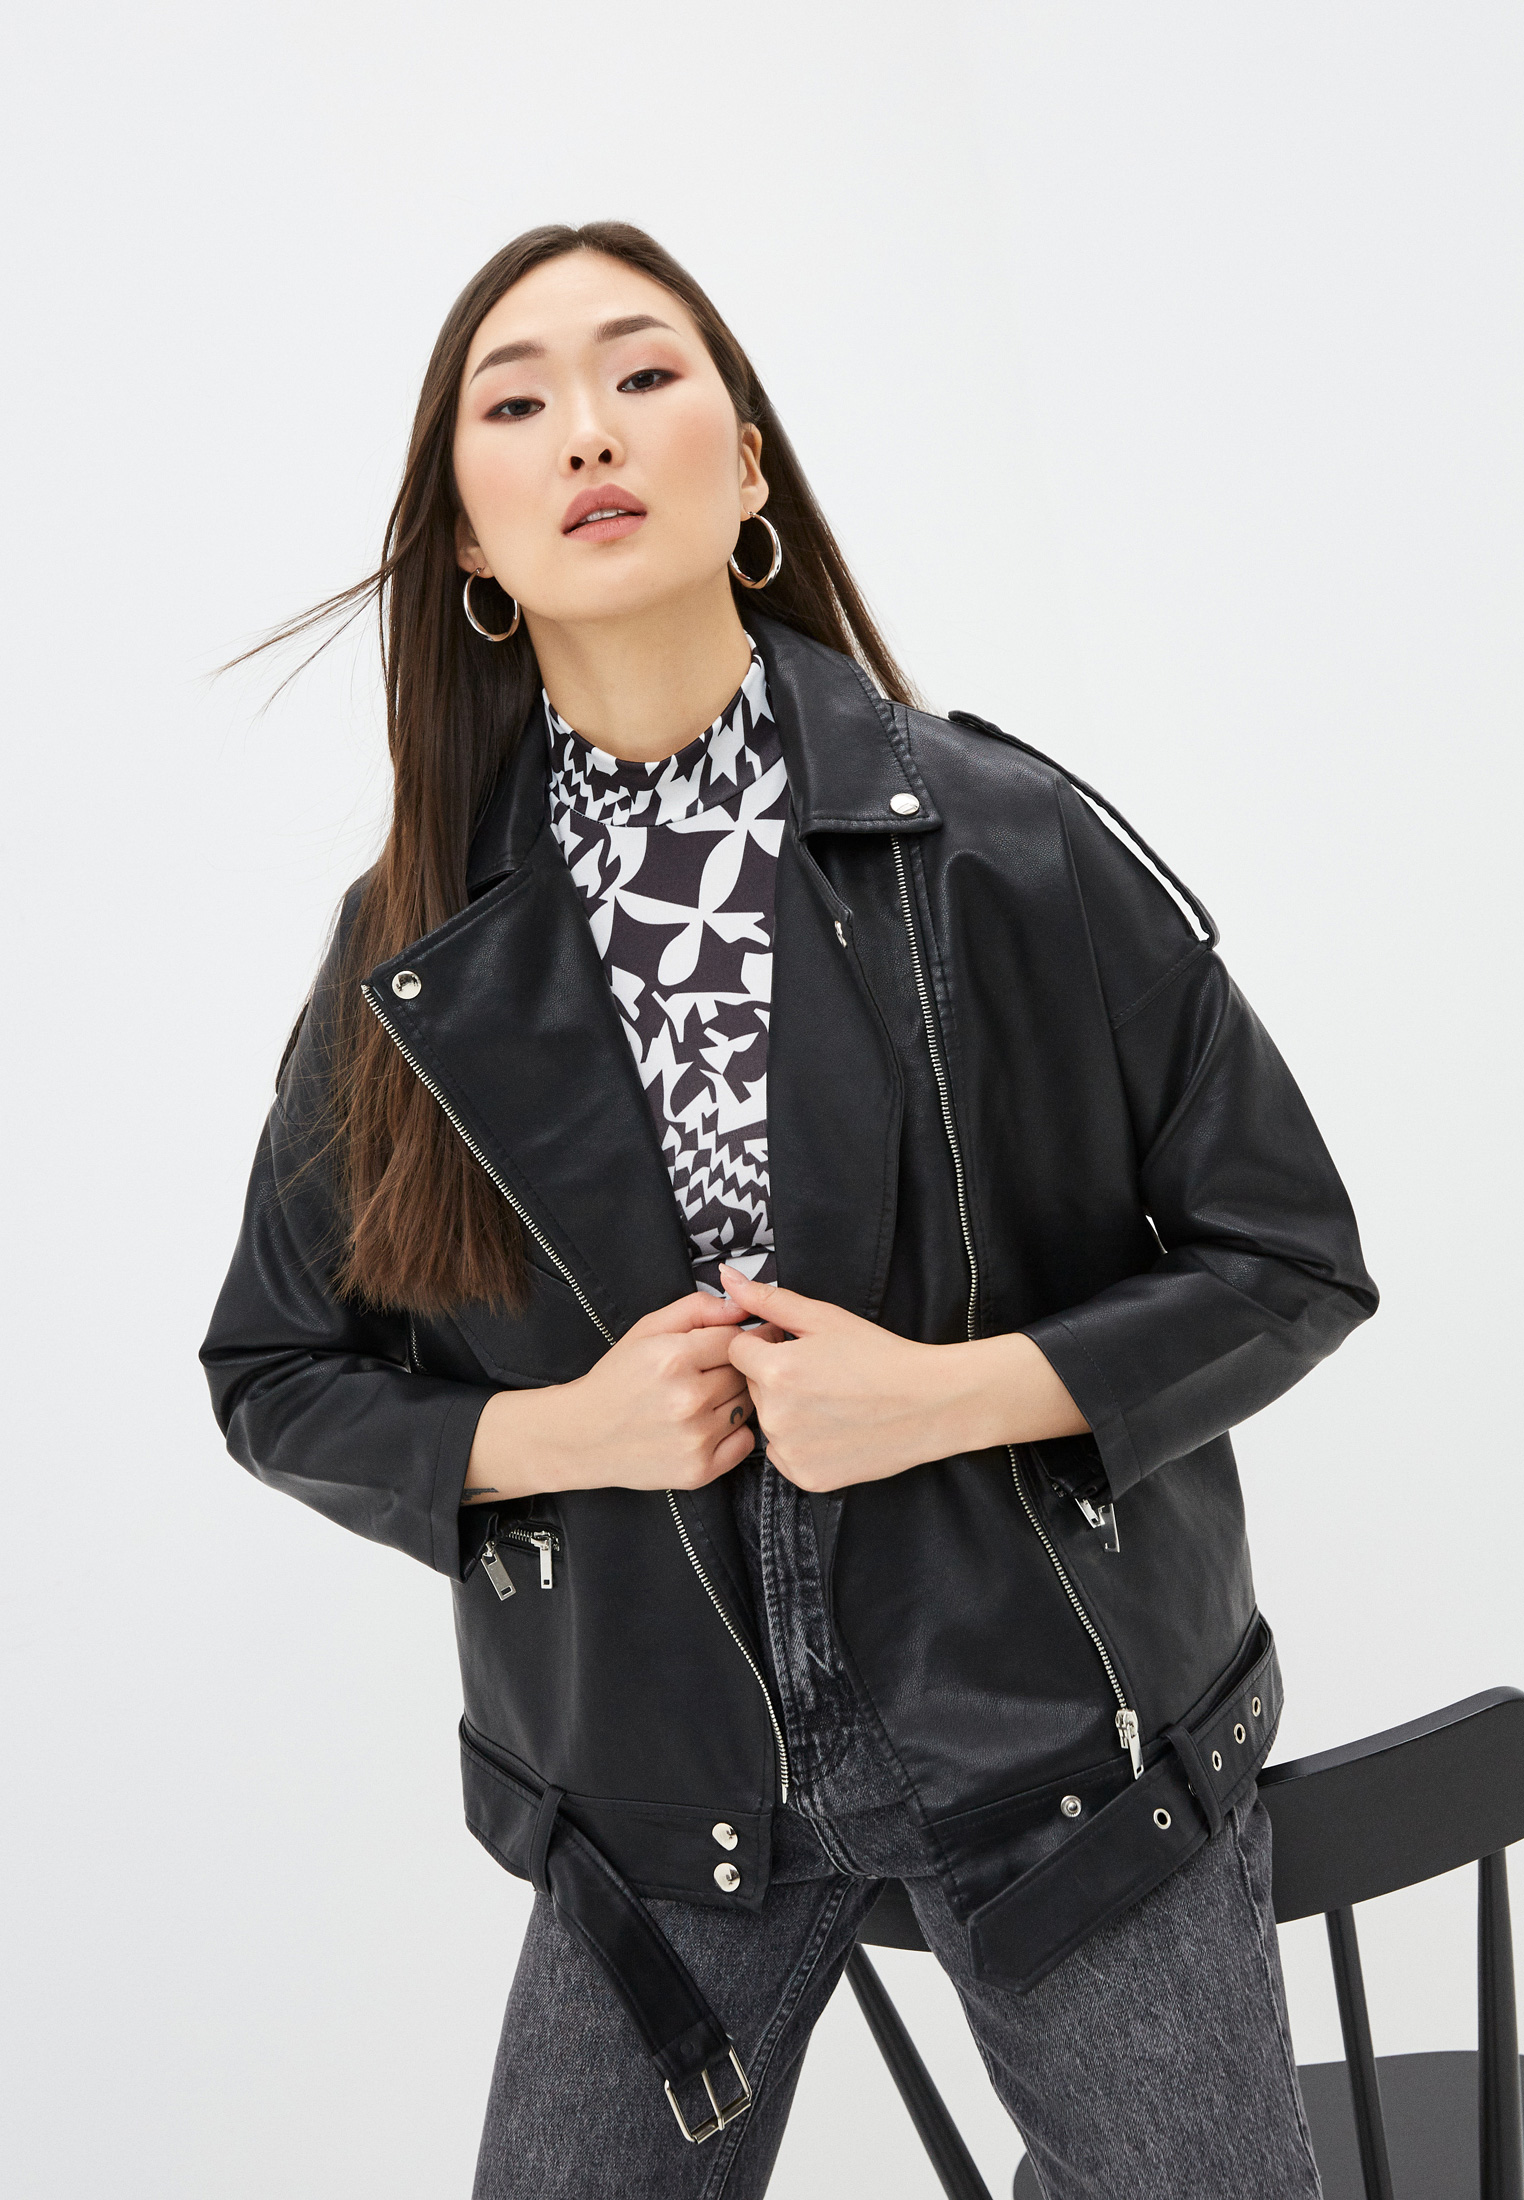 Кожаная куртка Aaquamarina Куртка кожаная Aaquamarina